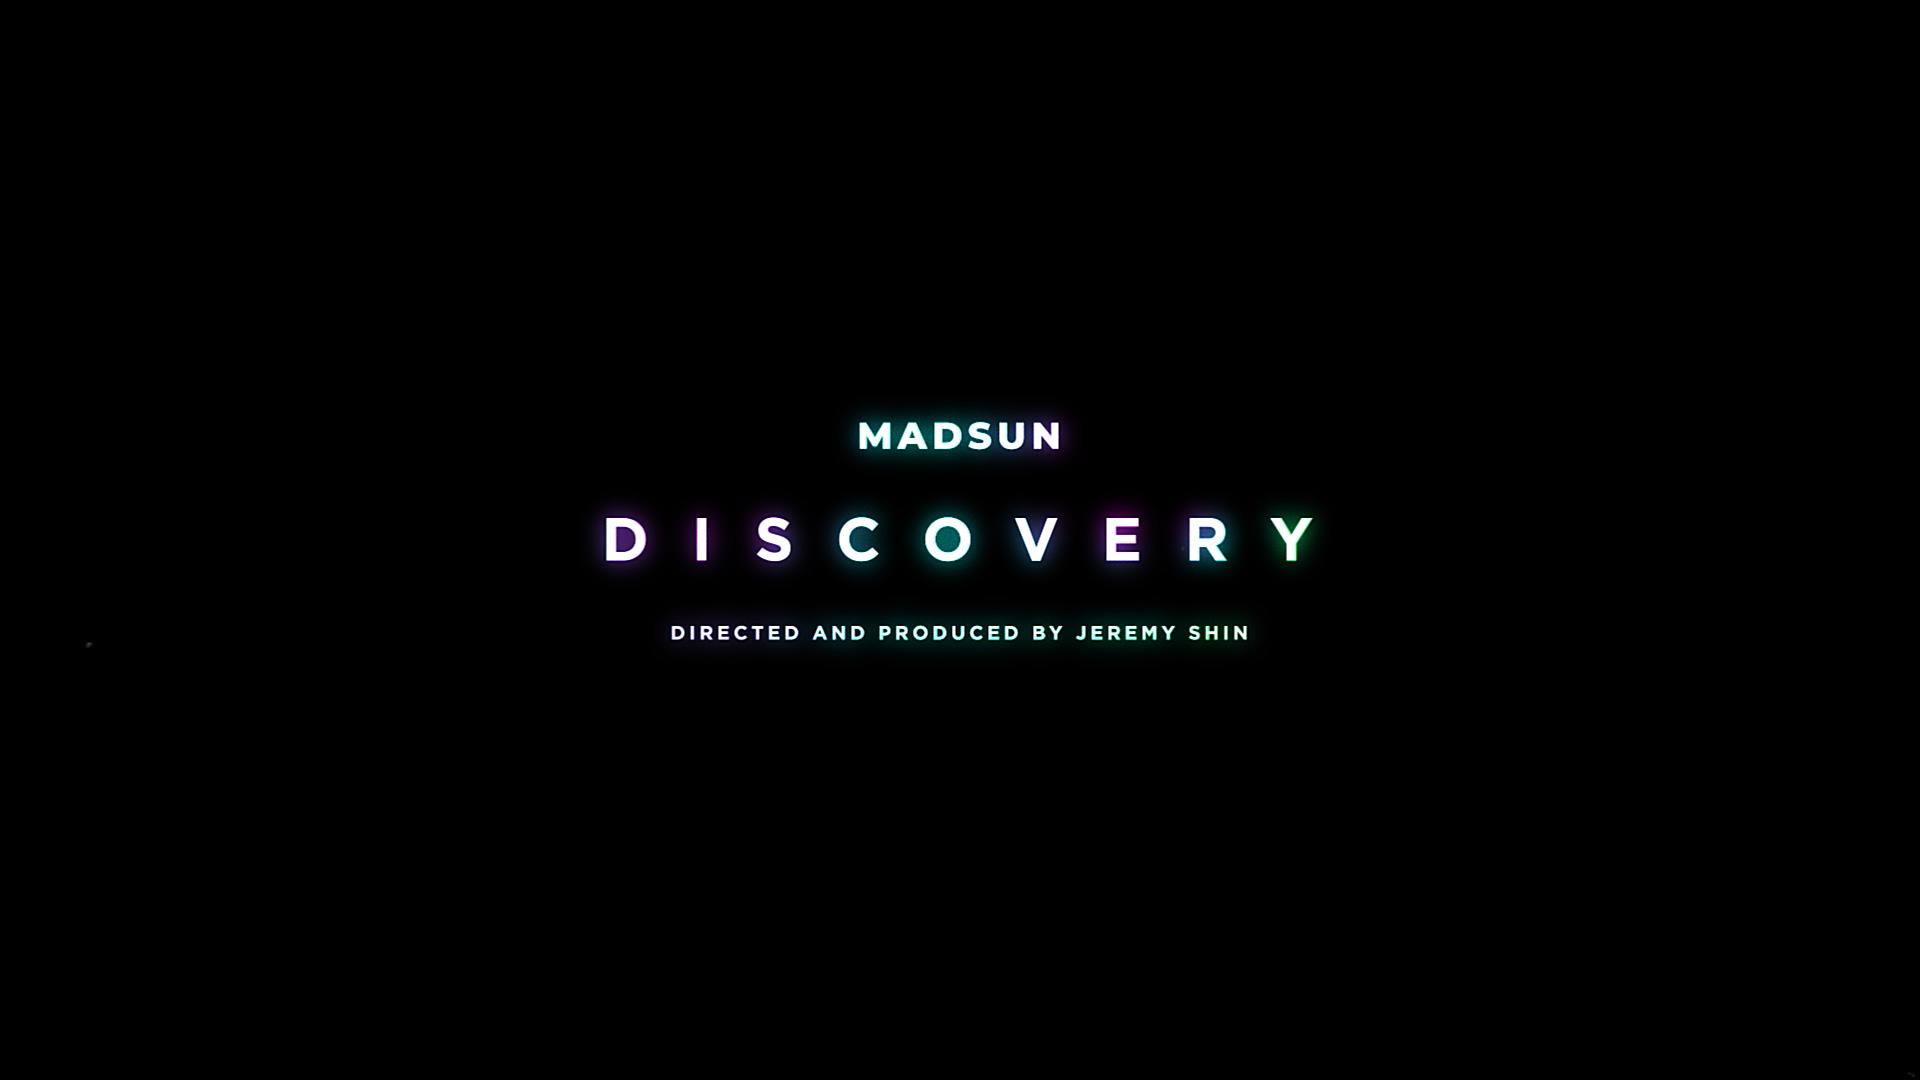 madsun-discovery-still-40